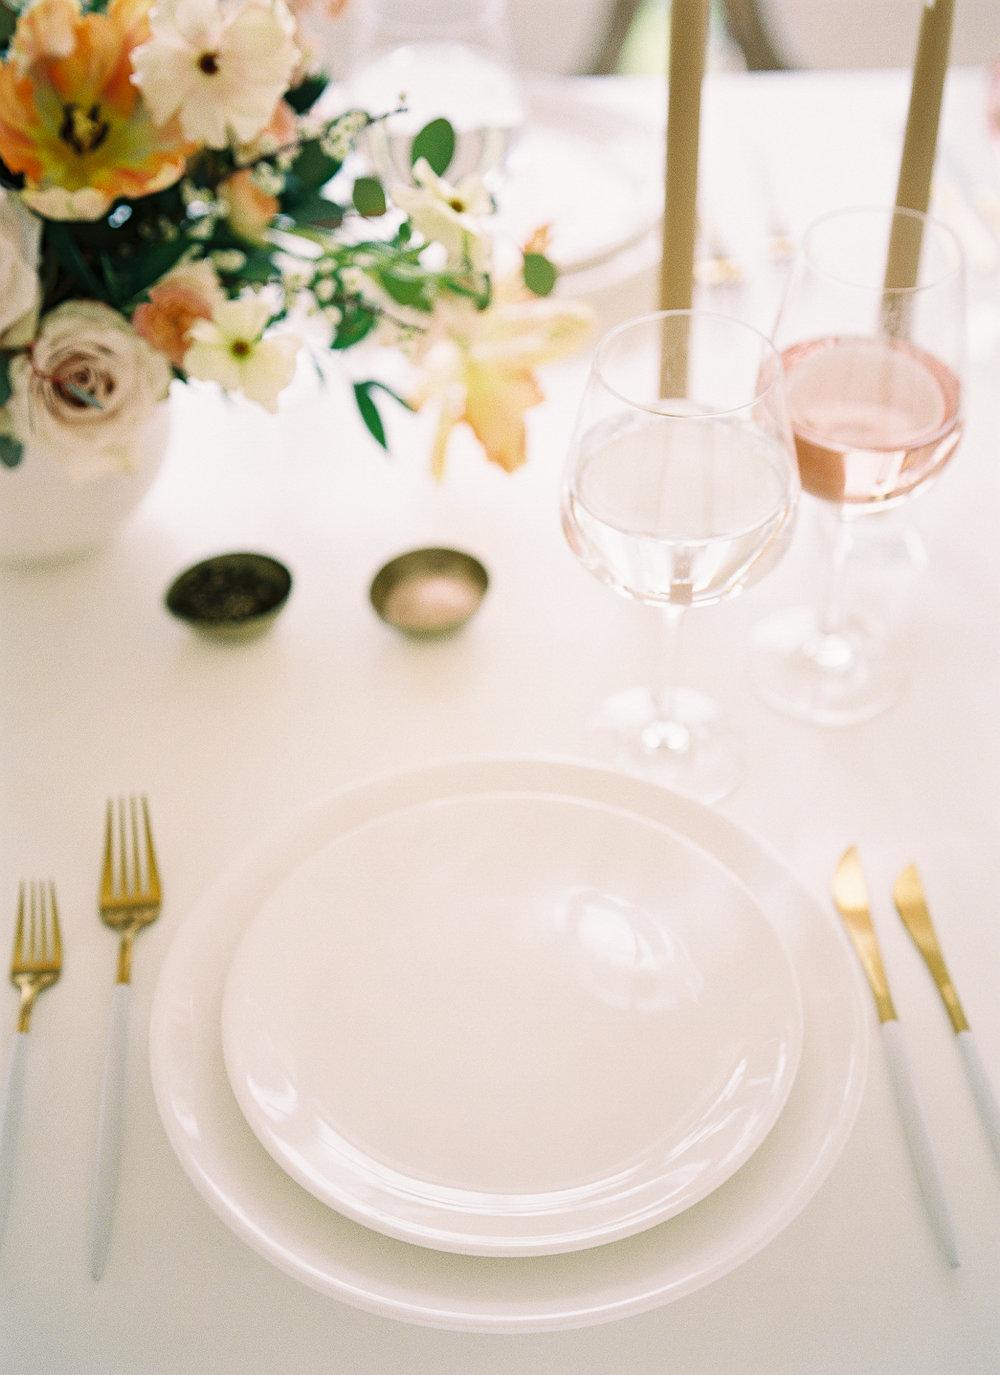 Glenview Mansion Wedding Venue  Lisamarieartistry.com (37 of 39).JPG